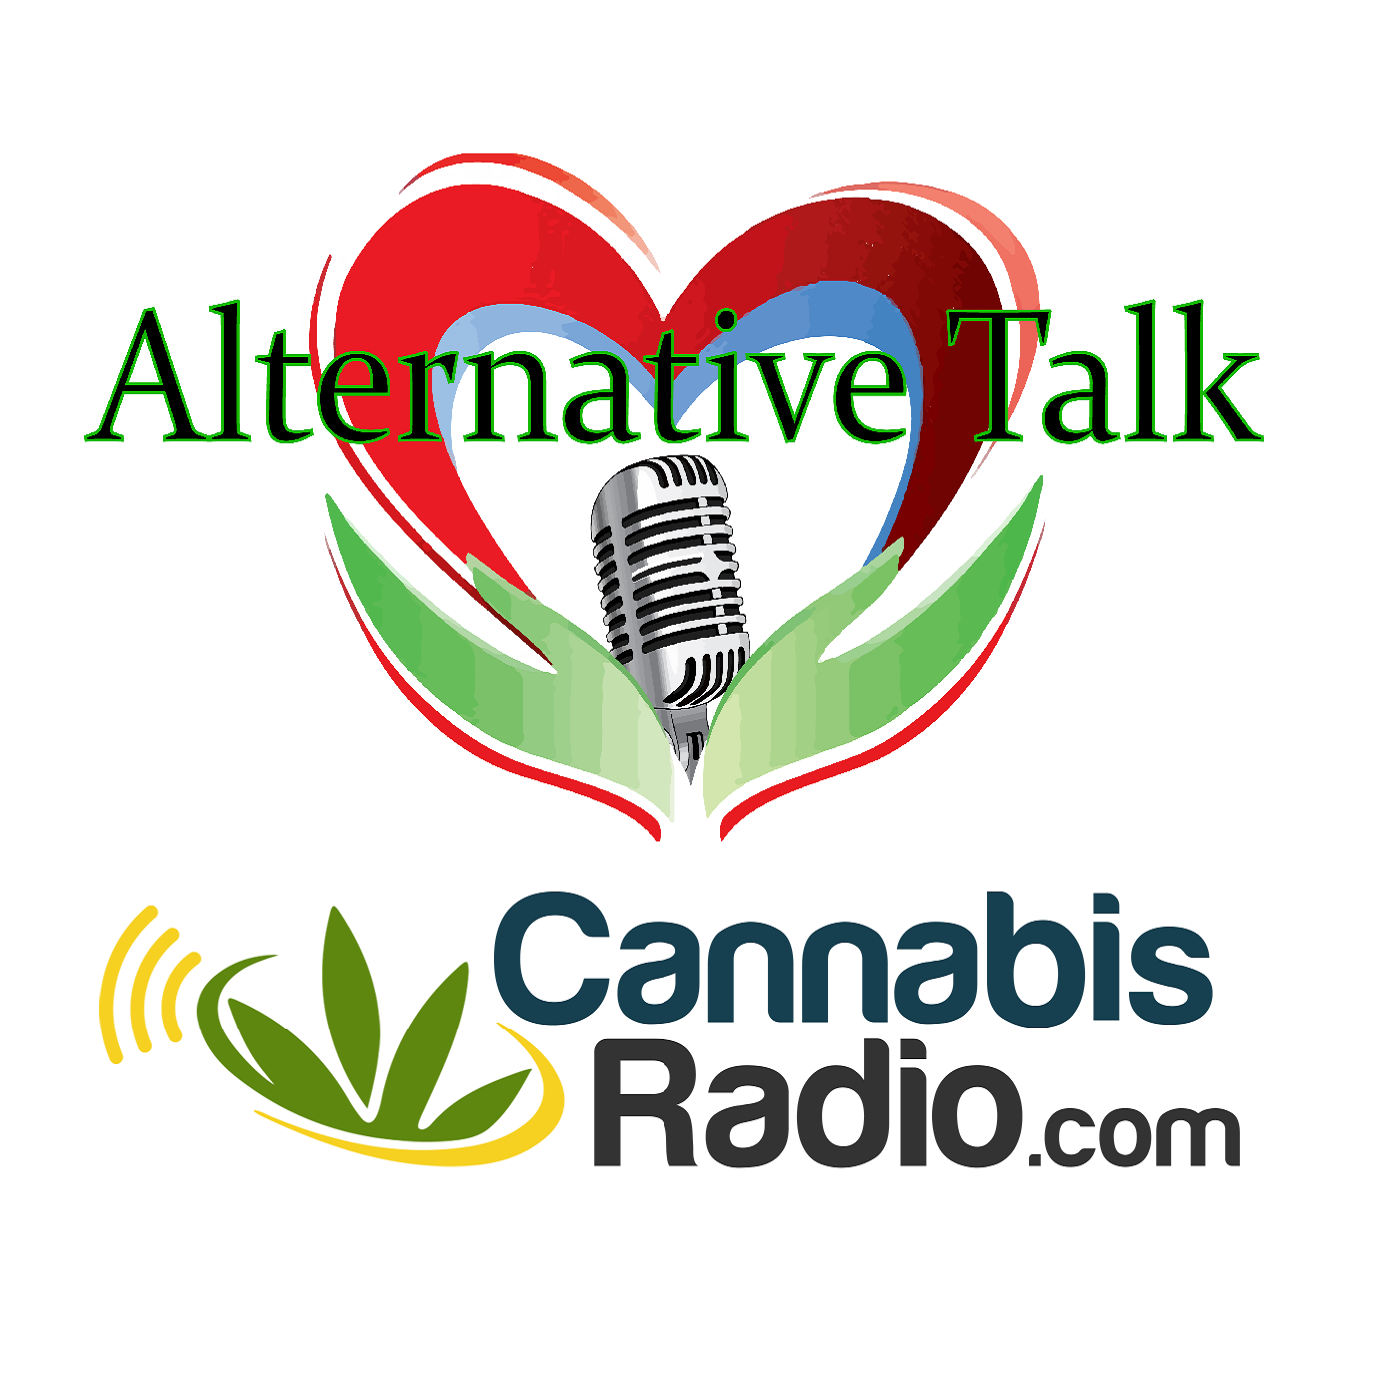 Alternative Talk